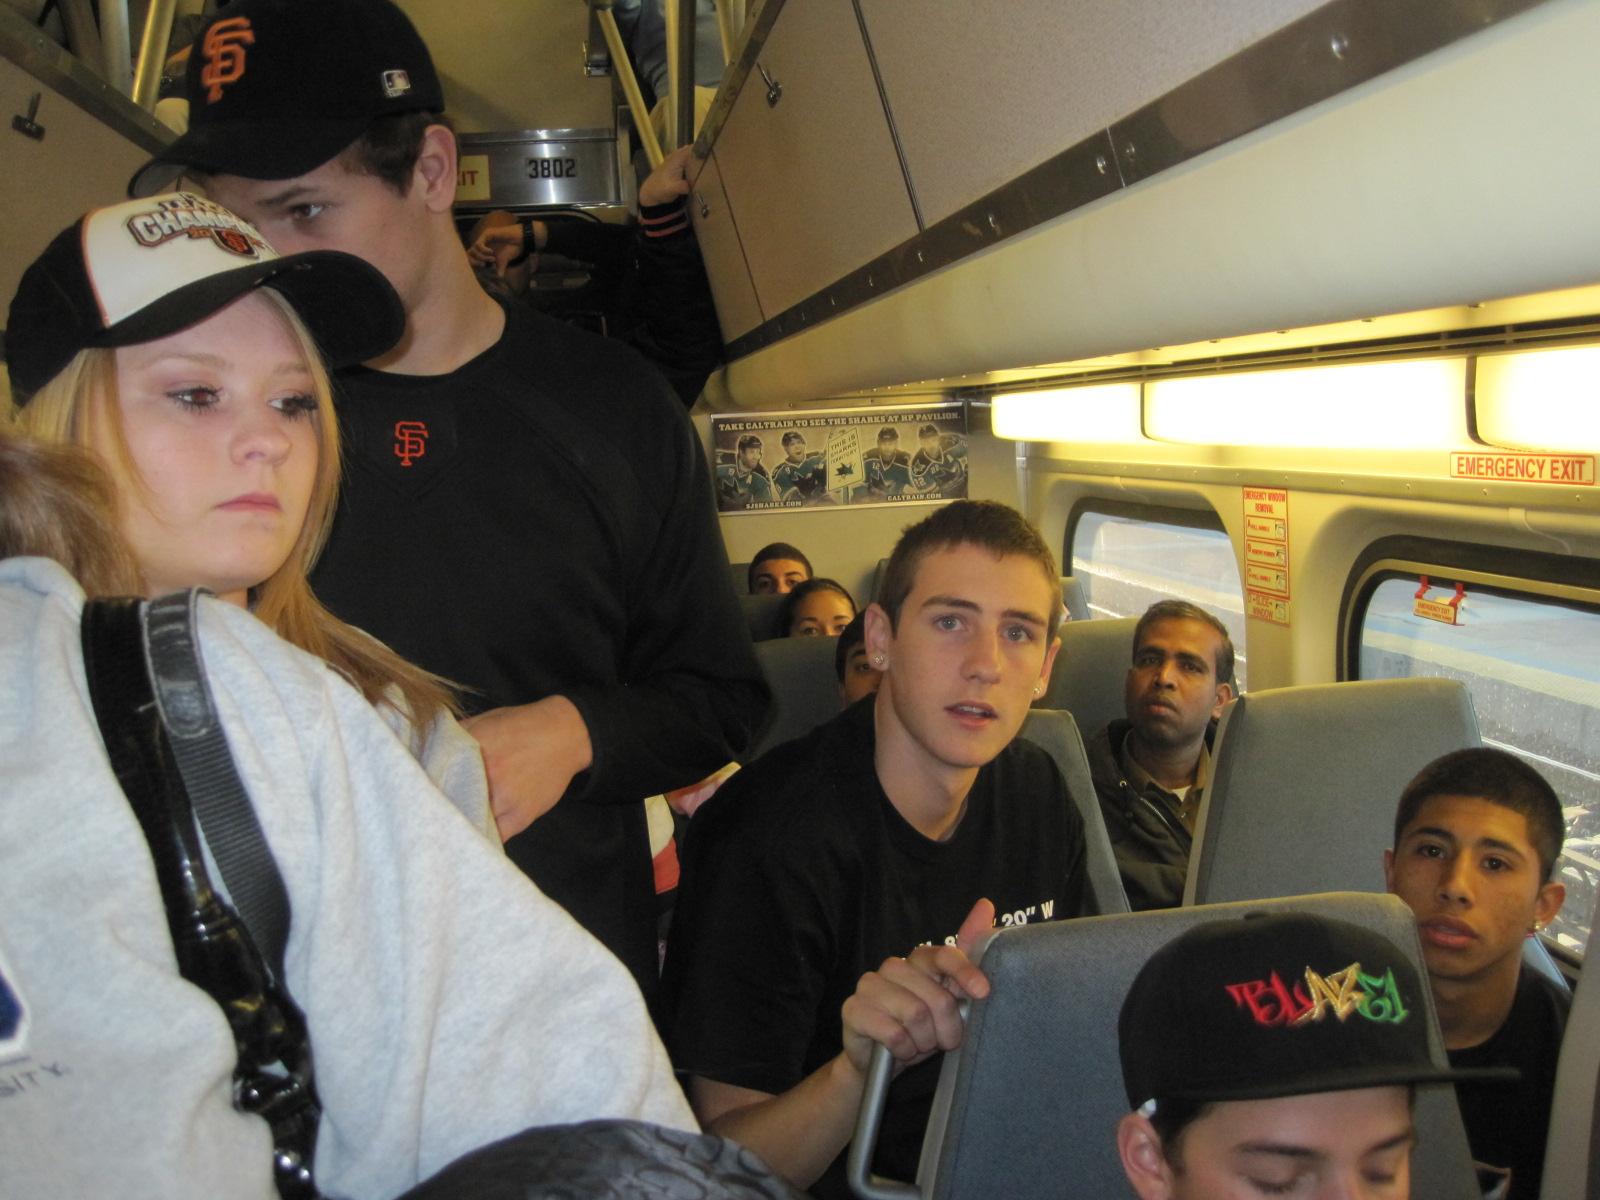 http://4.bp.blogspot.com/_HiqNq4An6Wc/TNIJoZy-KFI/AAAAAAAAHC0/I6dUa8IxPmY/s1600/Our+car+Sara+Colin.JPG